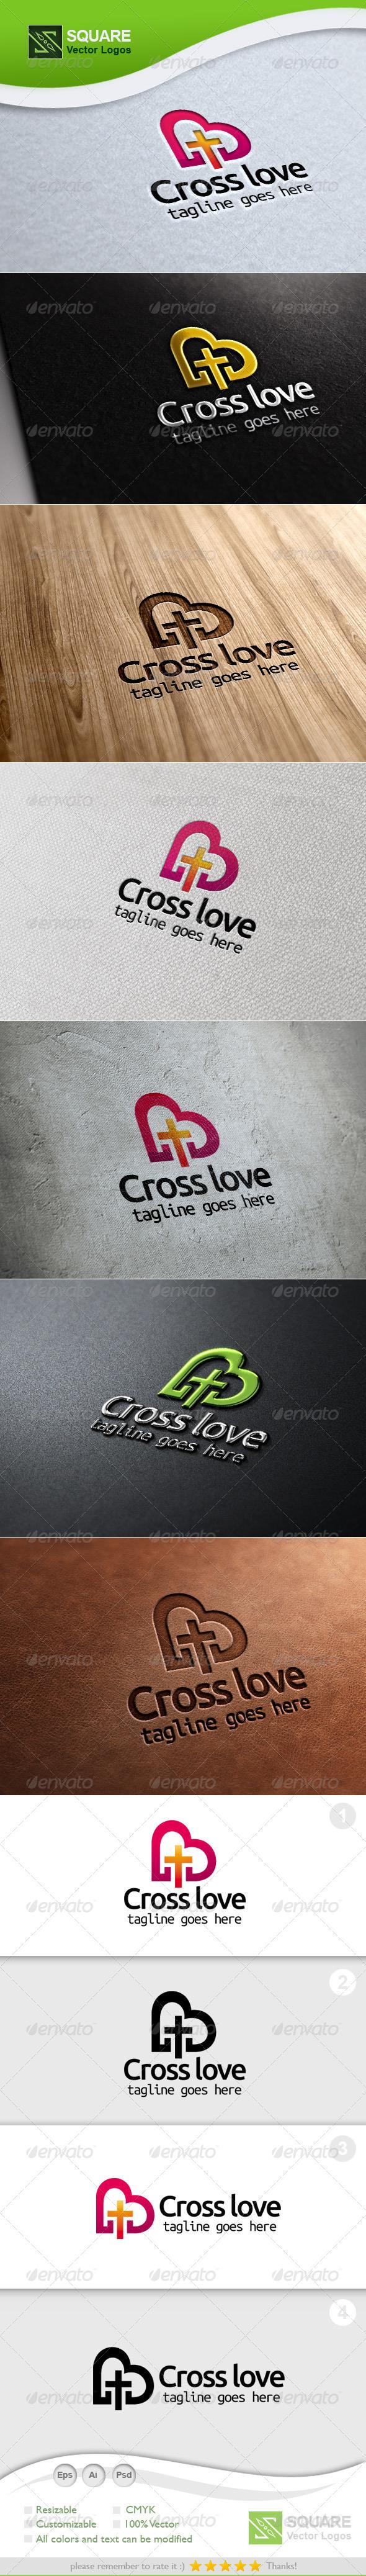 GraphicRiver Cross Love Vector Logo Template 5457296